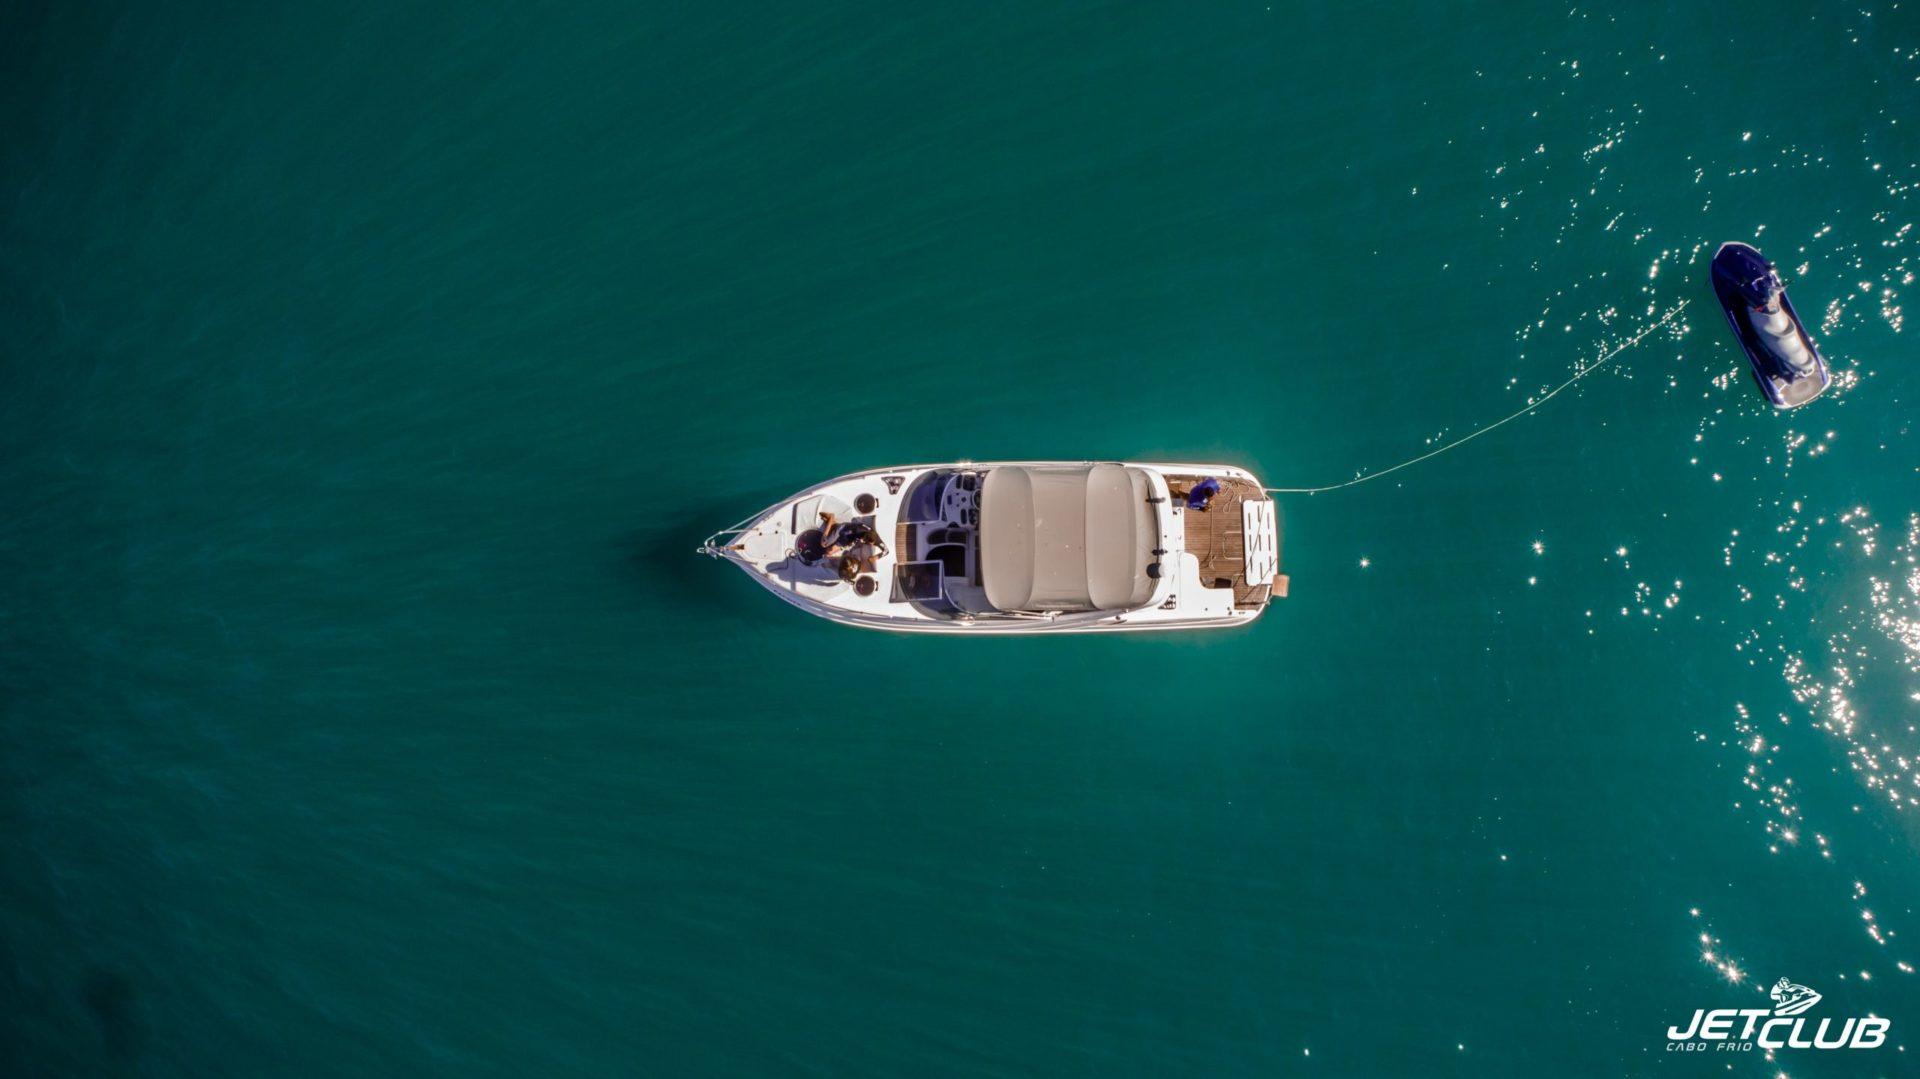 Nossa-Proposta-Marina-JetClub-Cabo-Frio-scaled